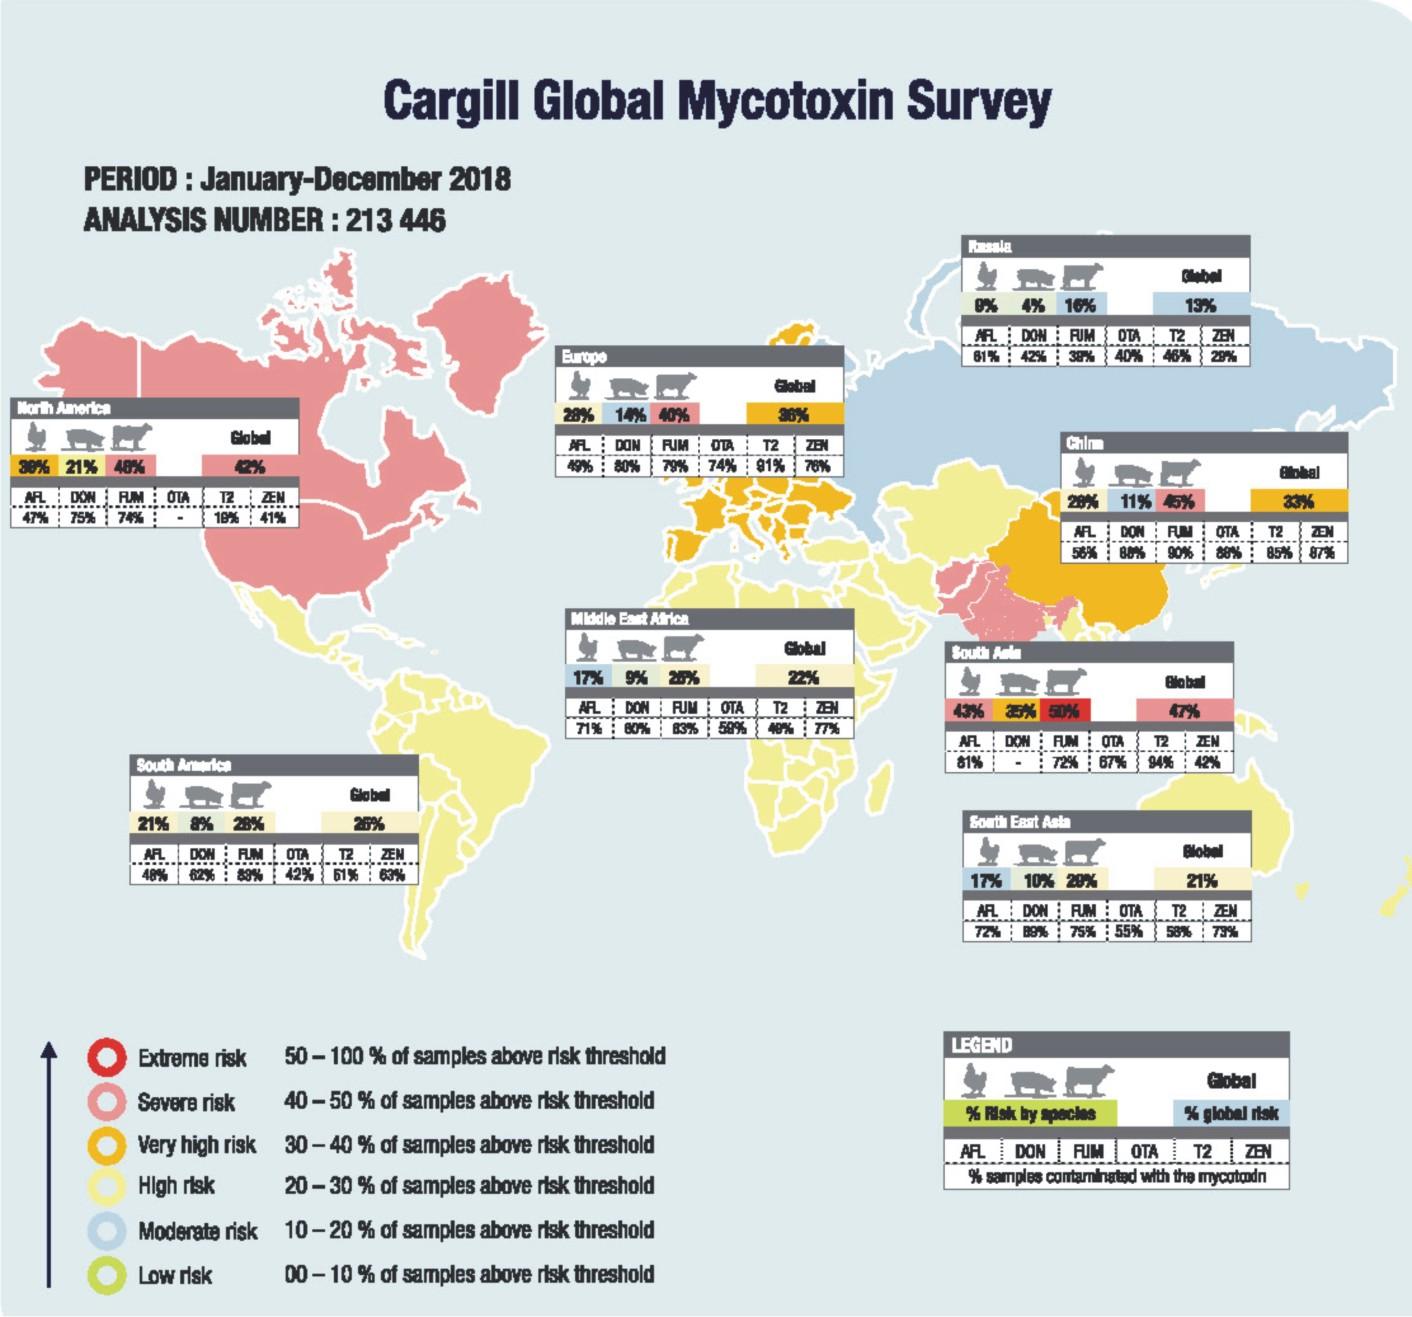 India featured in severe risk zone – Cargill Mycotoxin